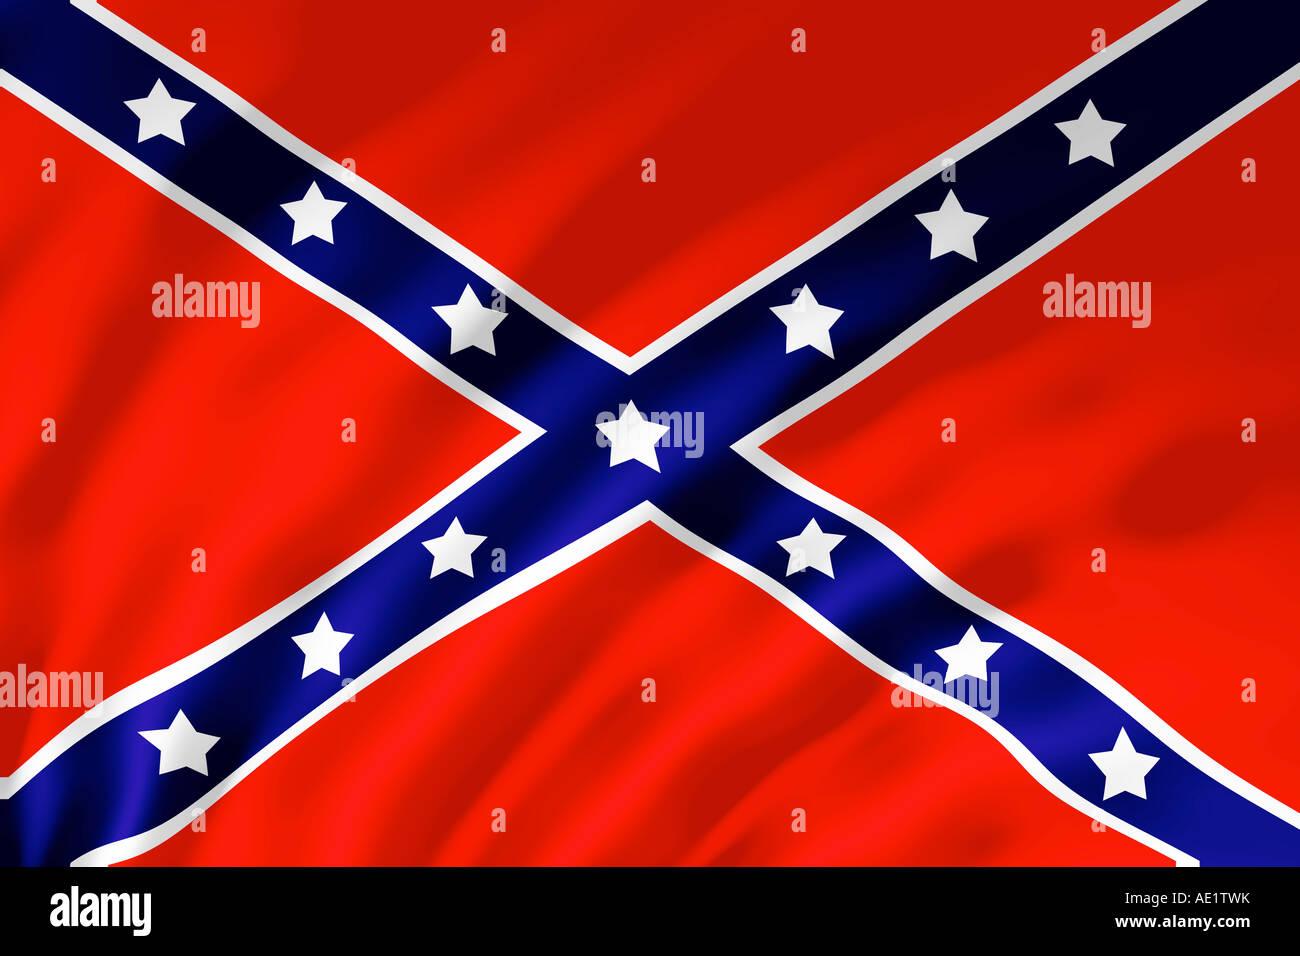 rebel flag stock photos rebel flag stock images alamy